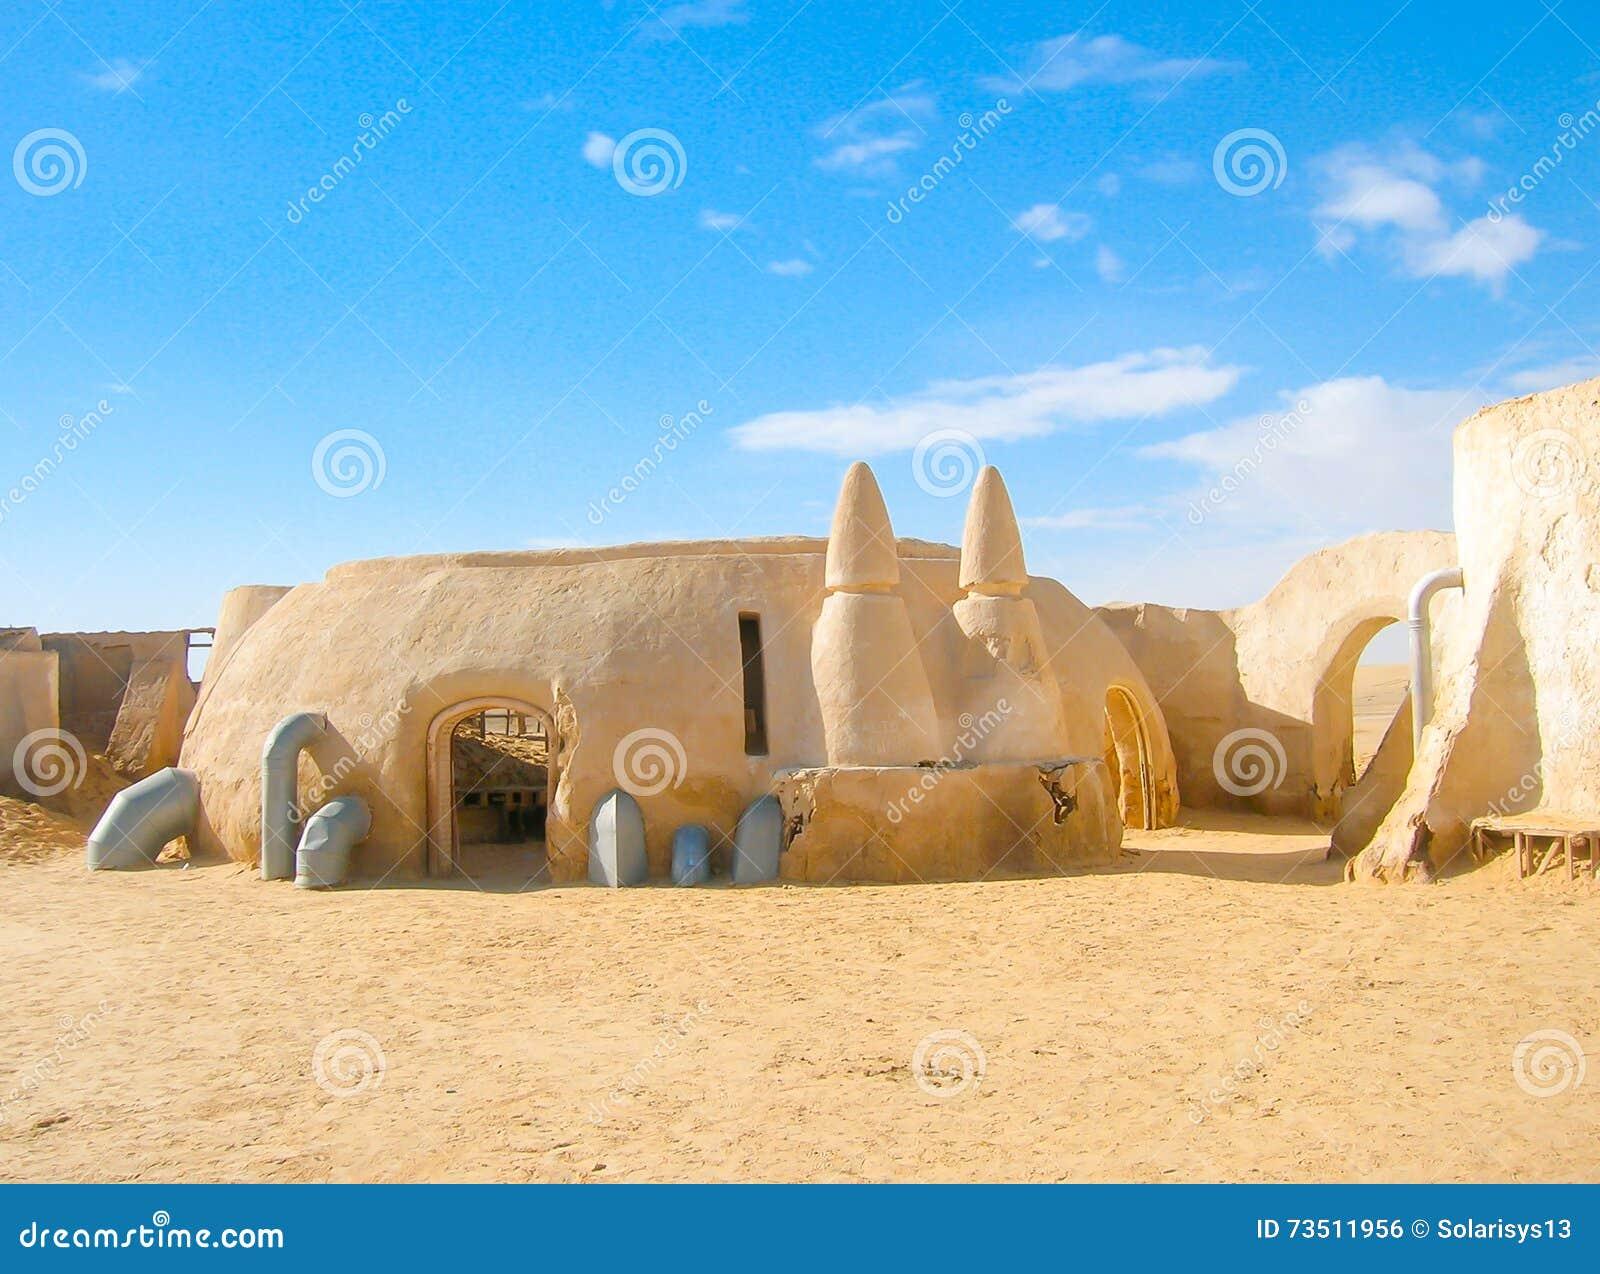 Star Wars Decoration In Sahara Desert Royalty-Free Stock